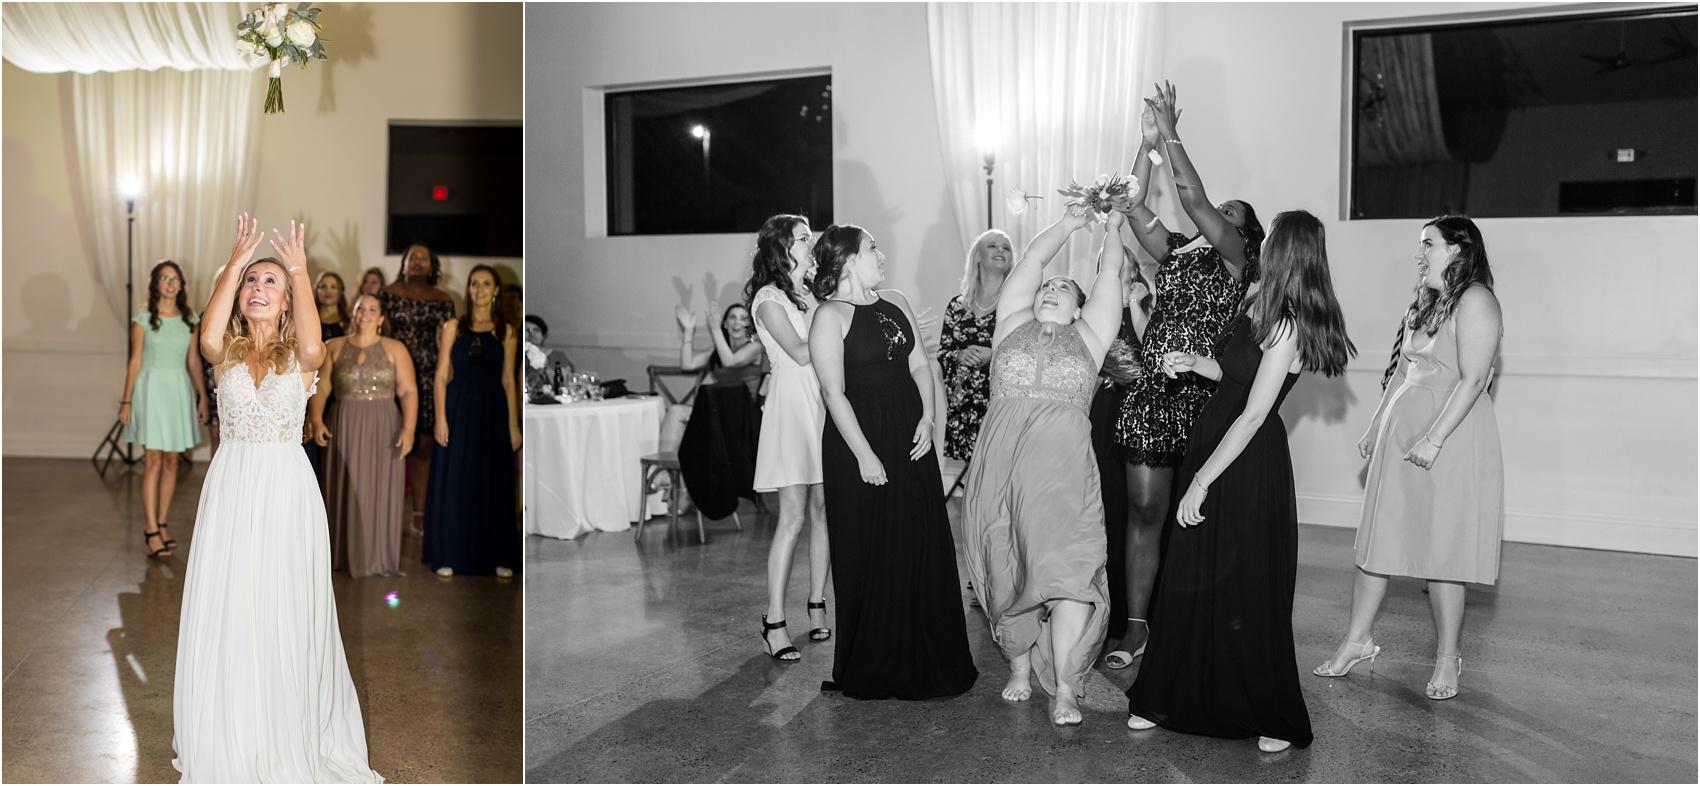 Savannah Eve Photography- Jurek-Woodworth Wedding- Sneak Peek-108.jpg